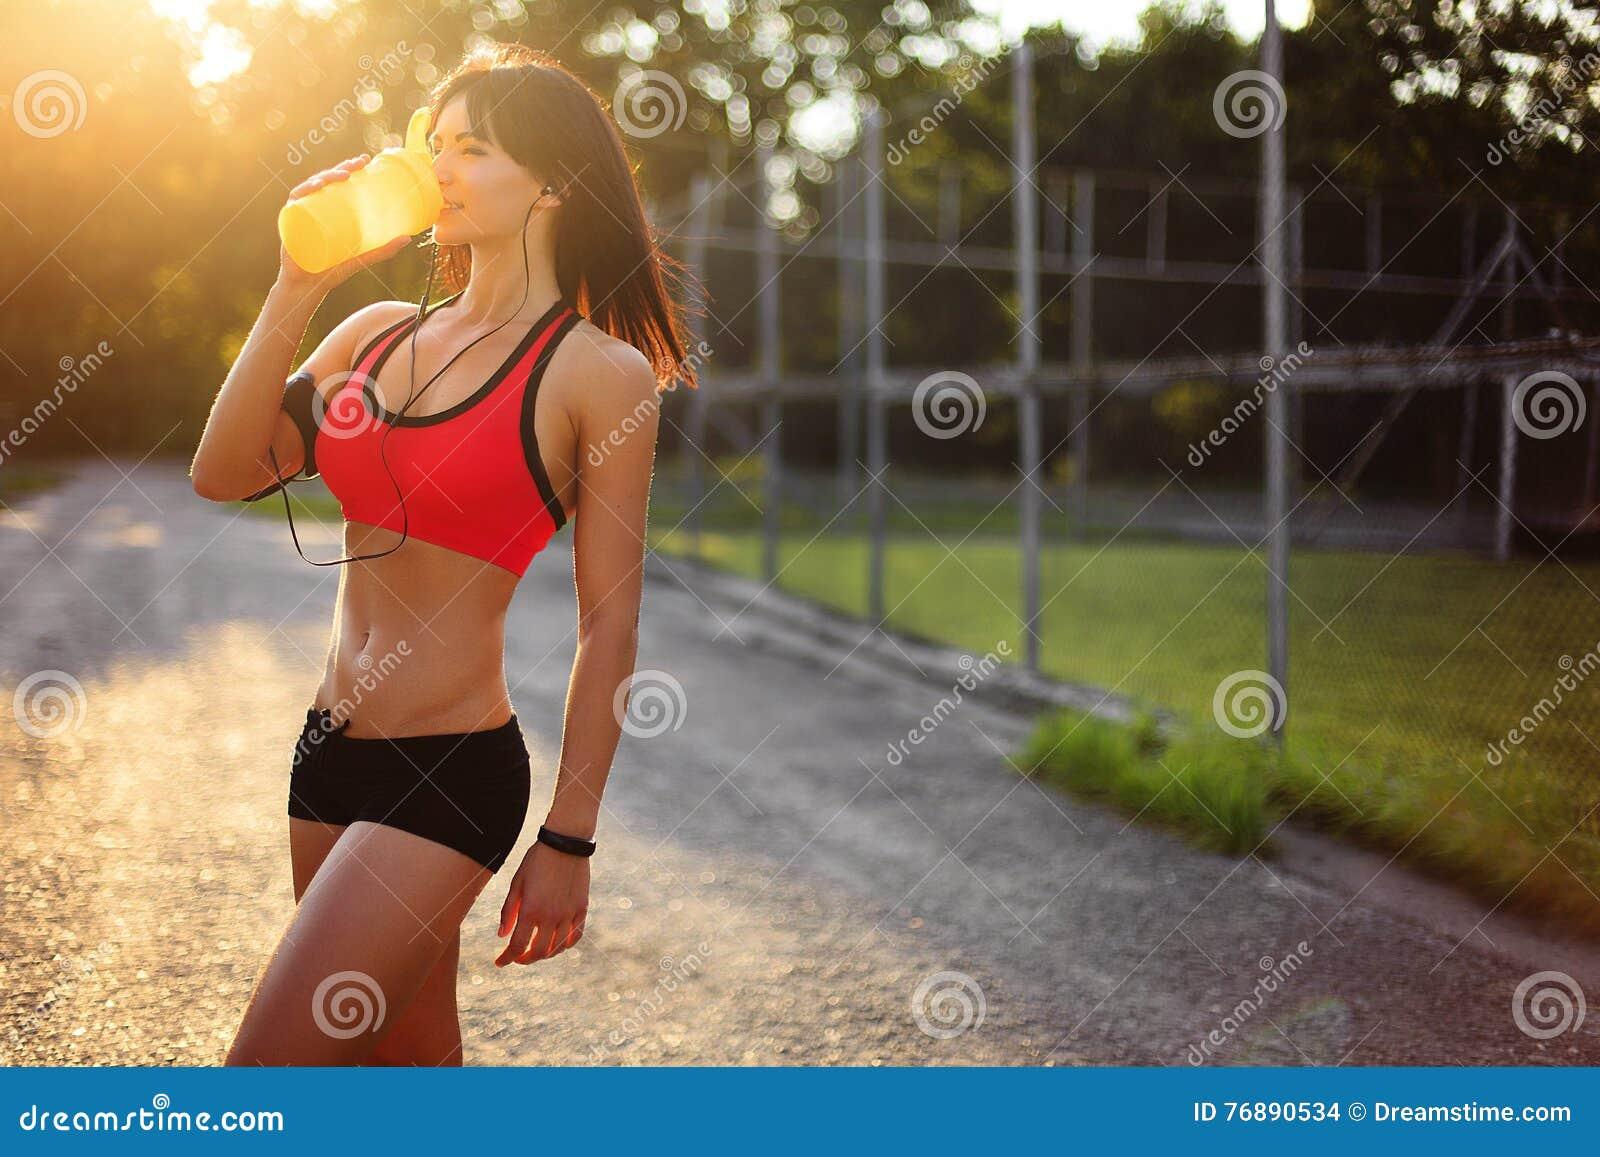 proteinshake joggen